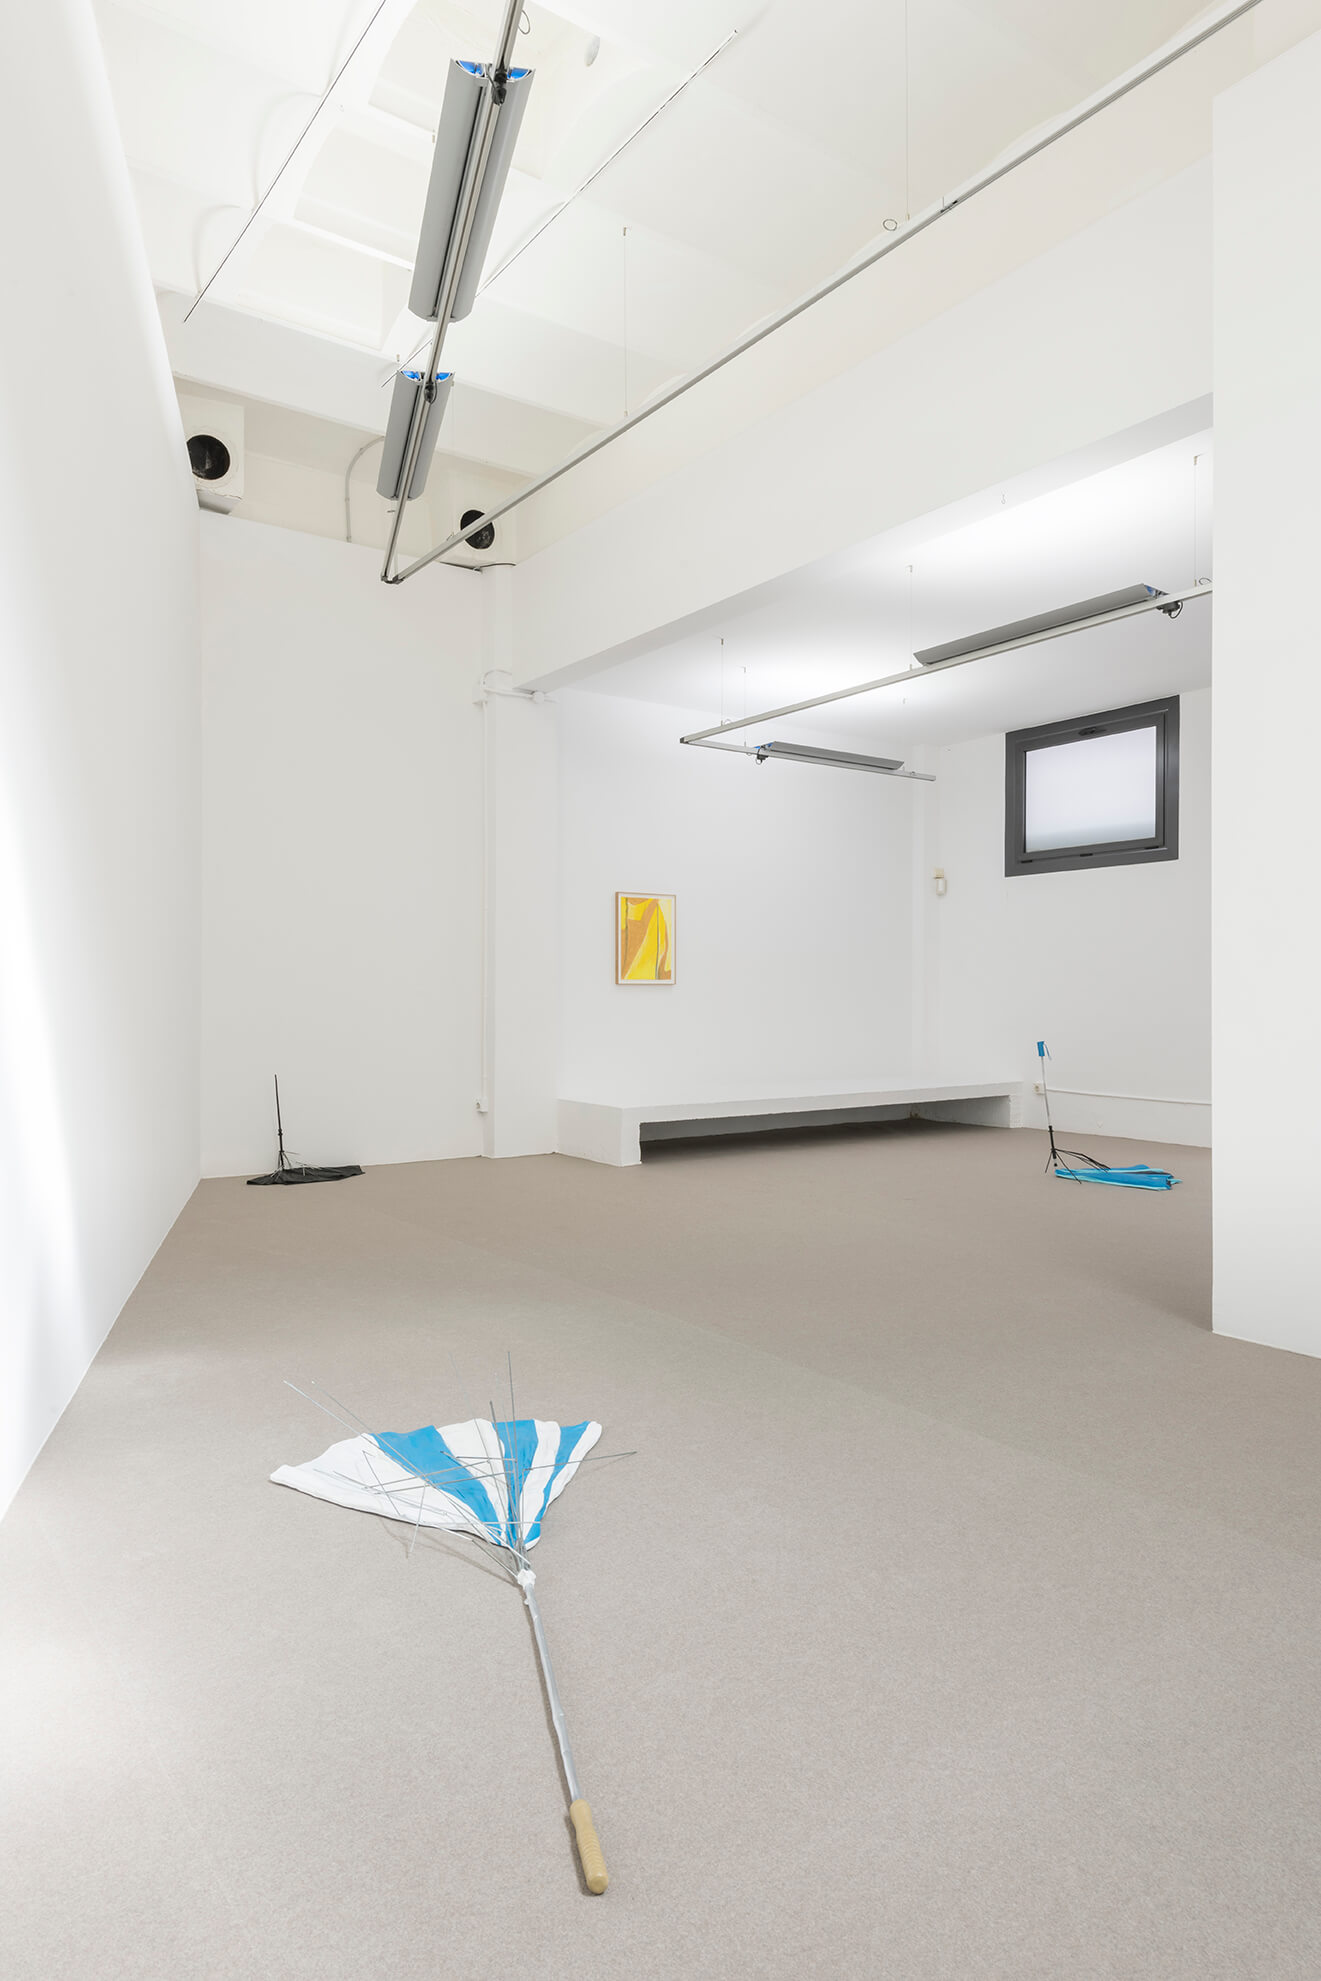 Installation view: America, ProjecteSD | America | ProjecteSD